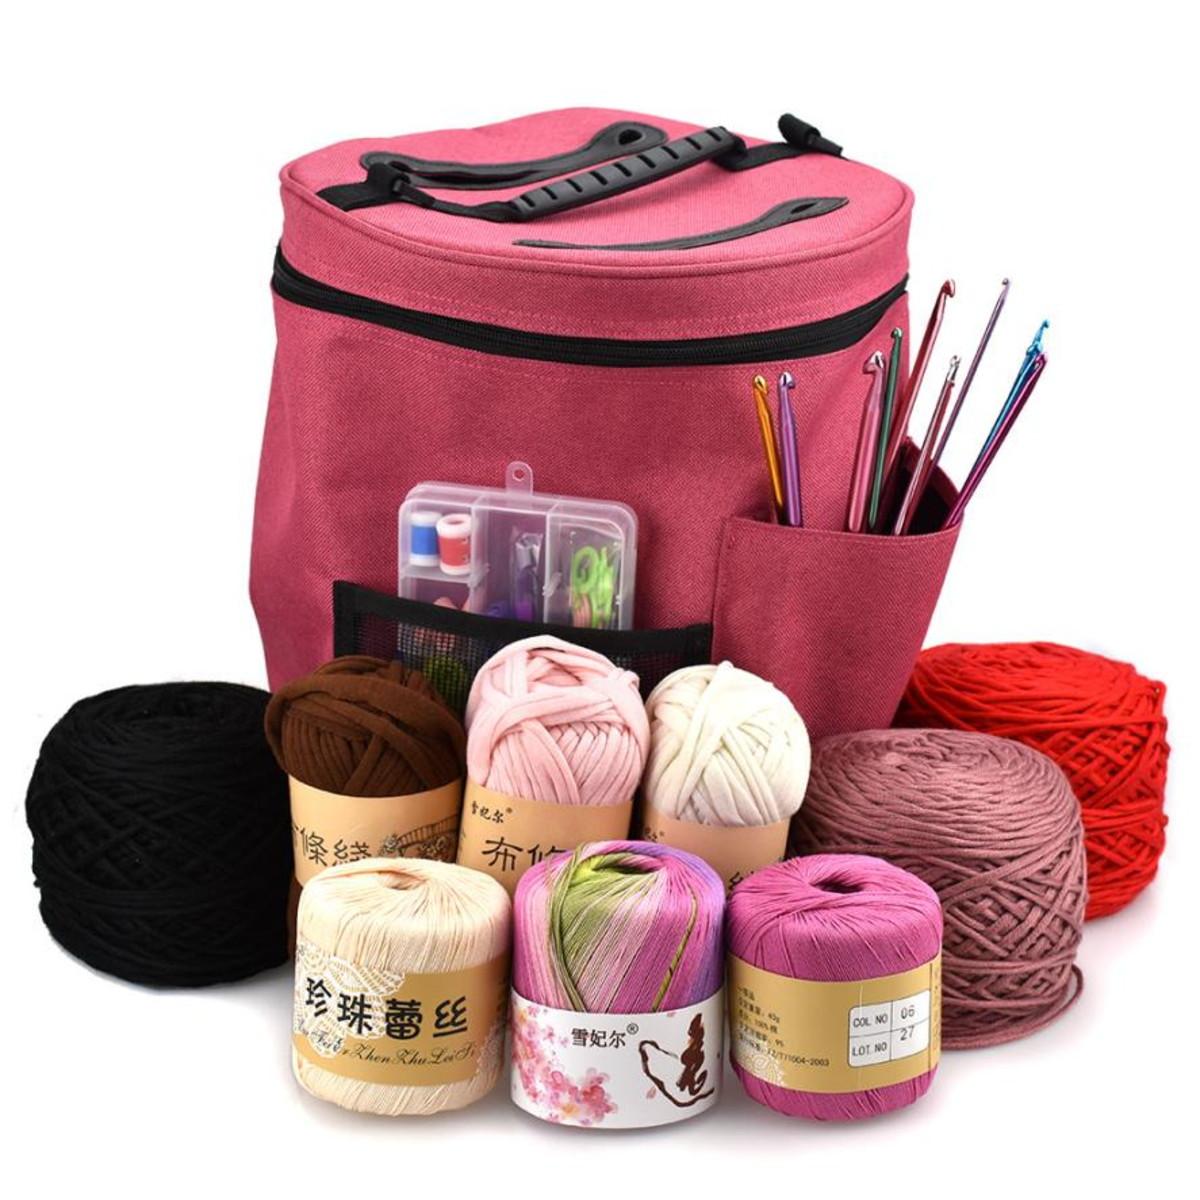 39472914bb Bolsa Organizadora - Bag de Artesanato no Elo7